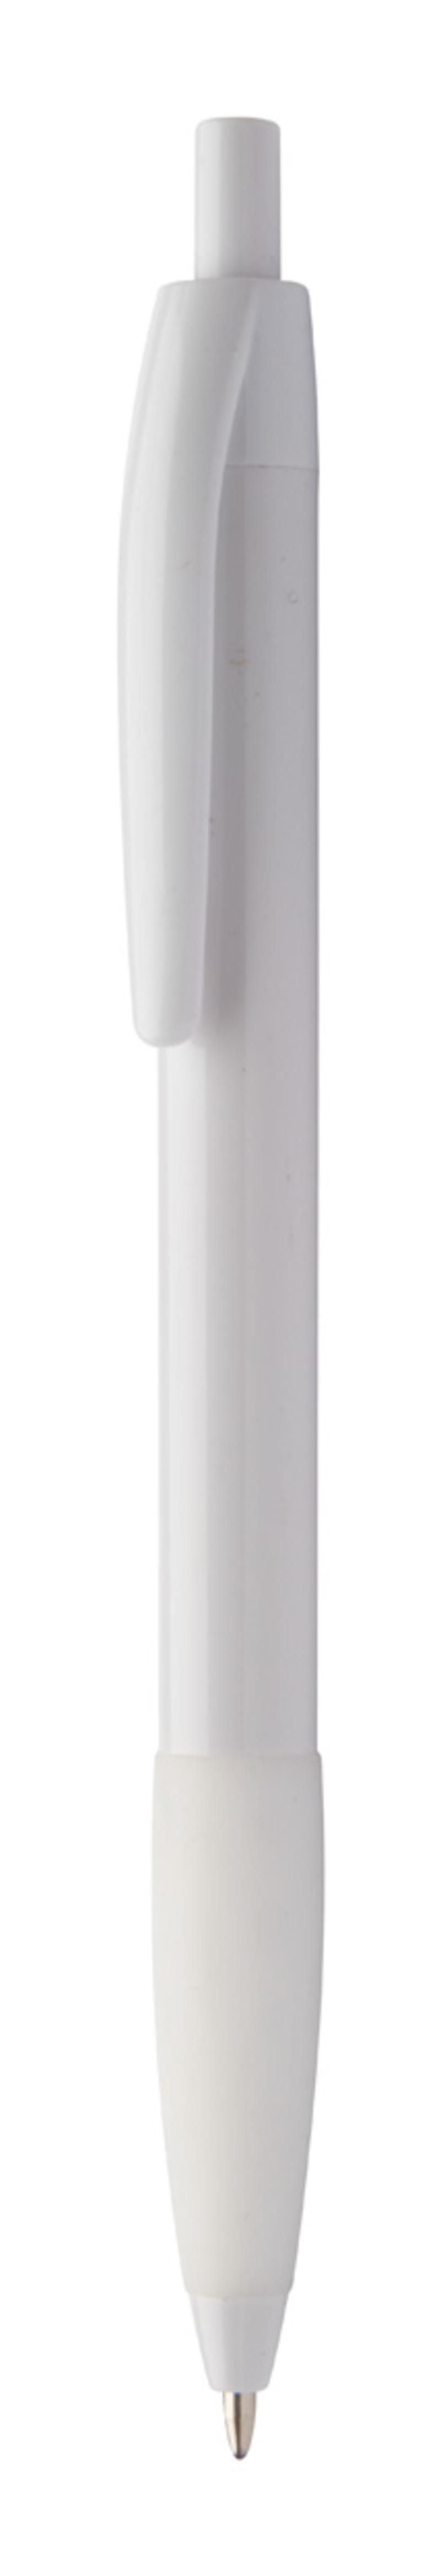 Panther ballpoint pen